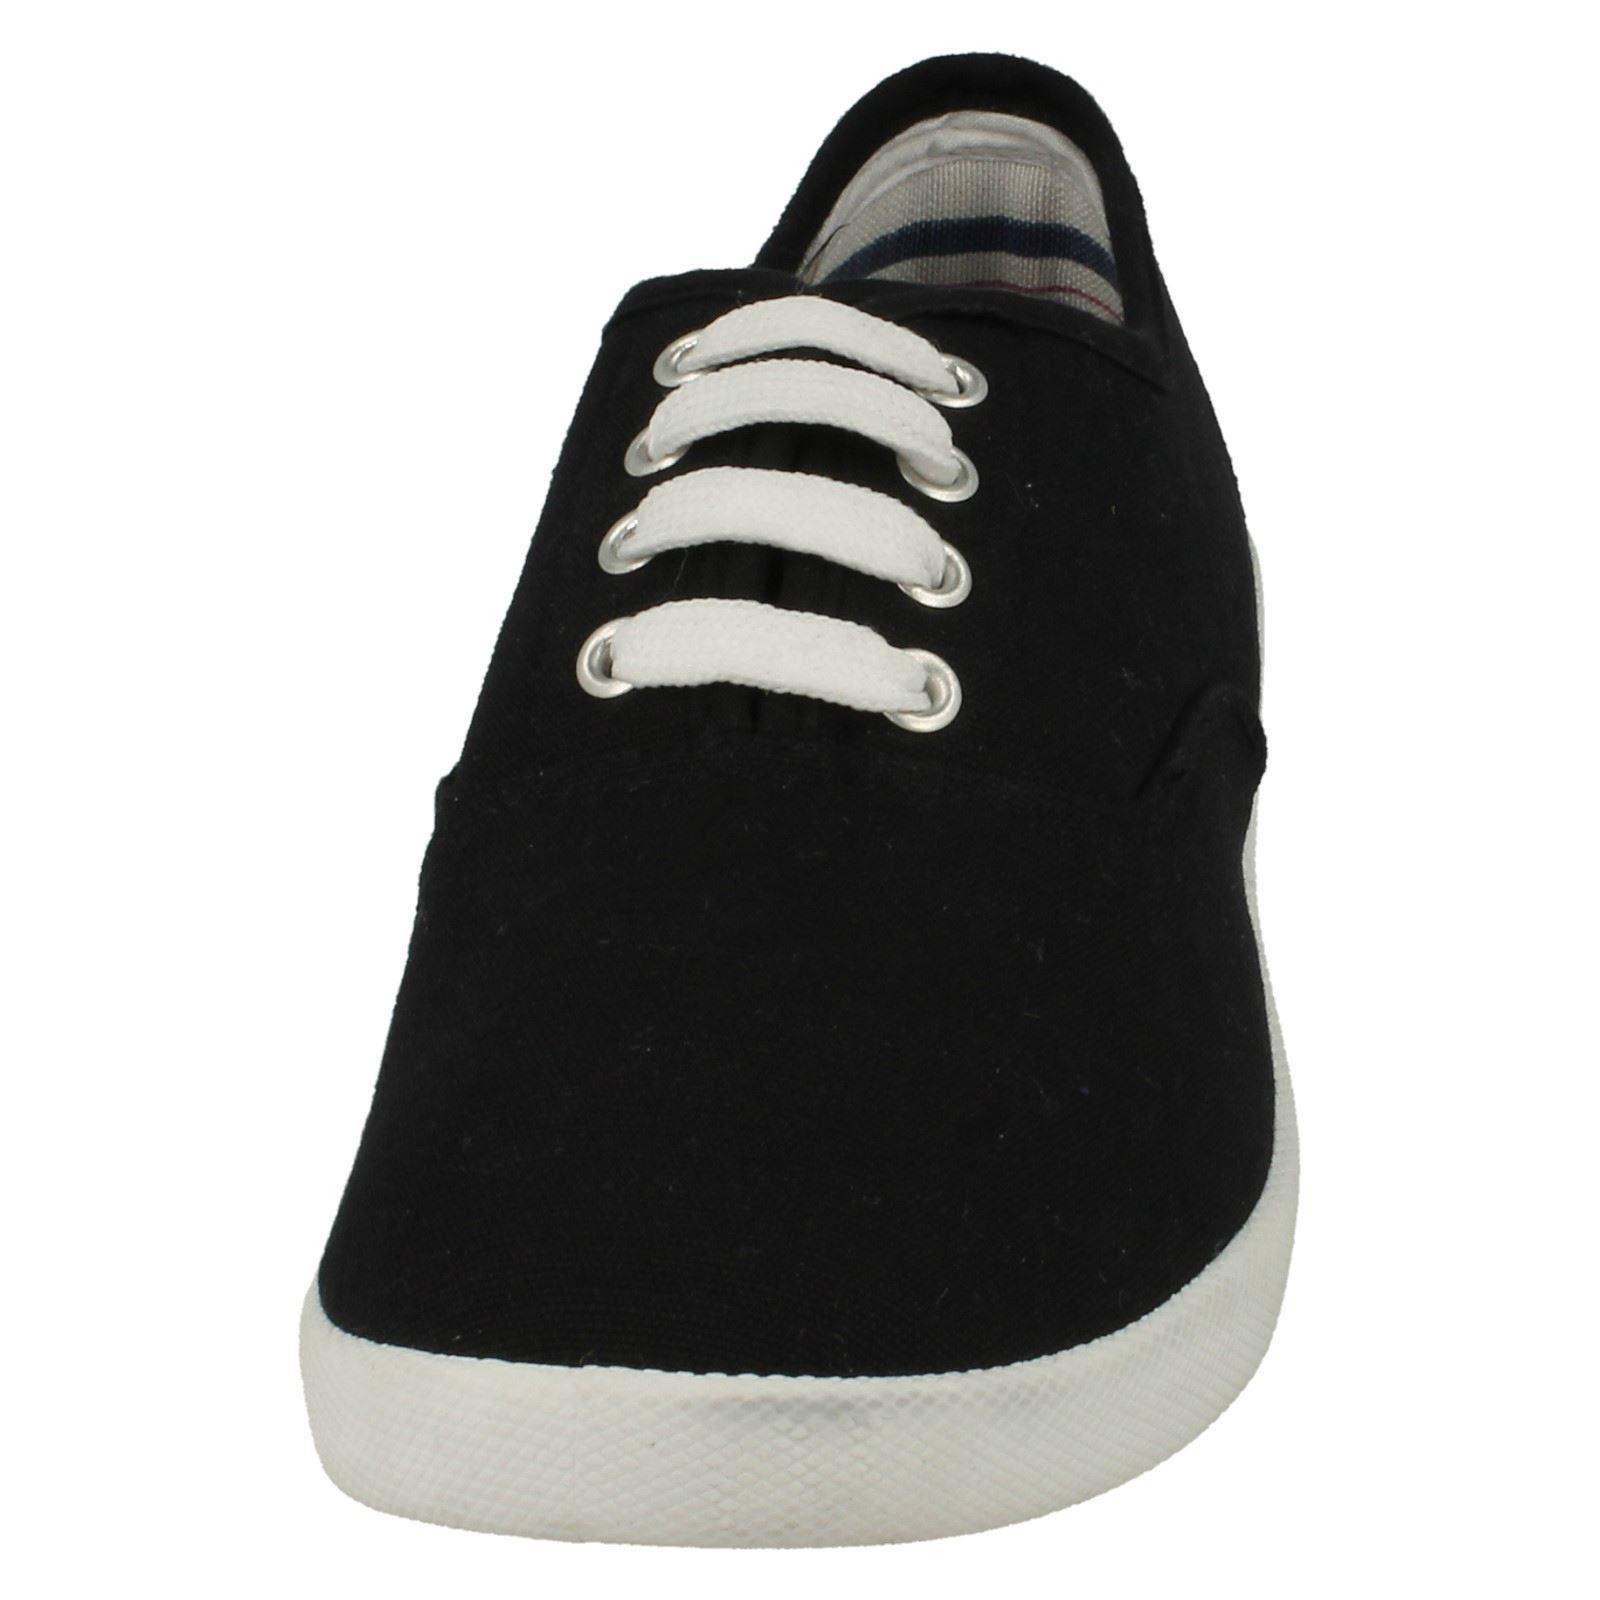 Spot On Zapatos de cuña de Lona Dama